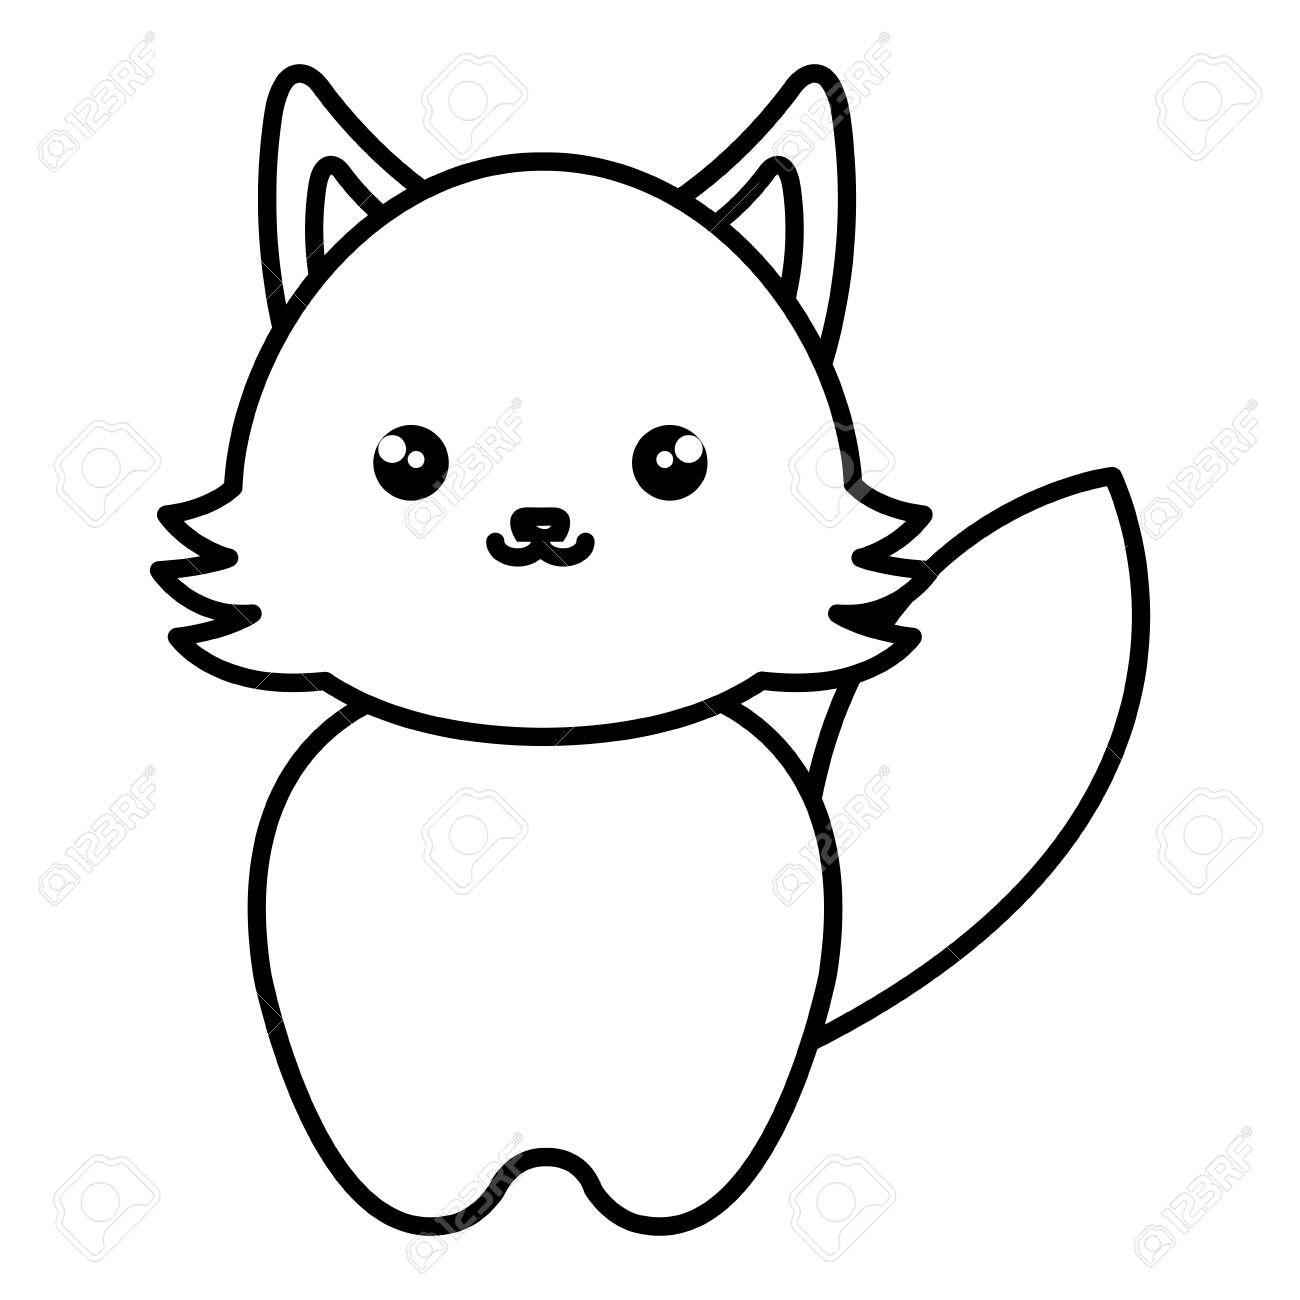 cute and tender fox kawaii style vector illustration design ,